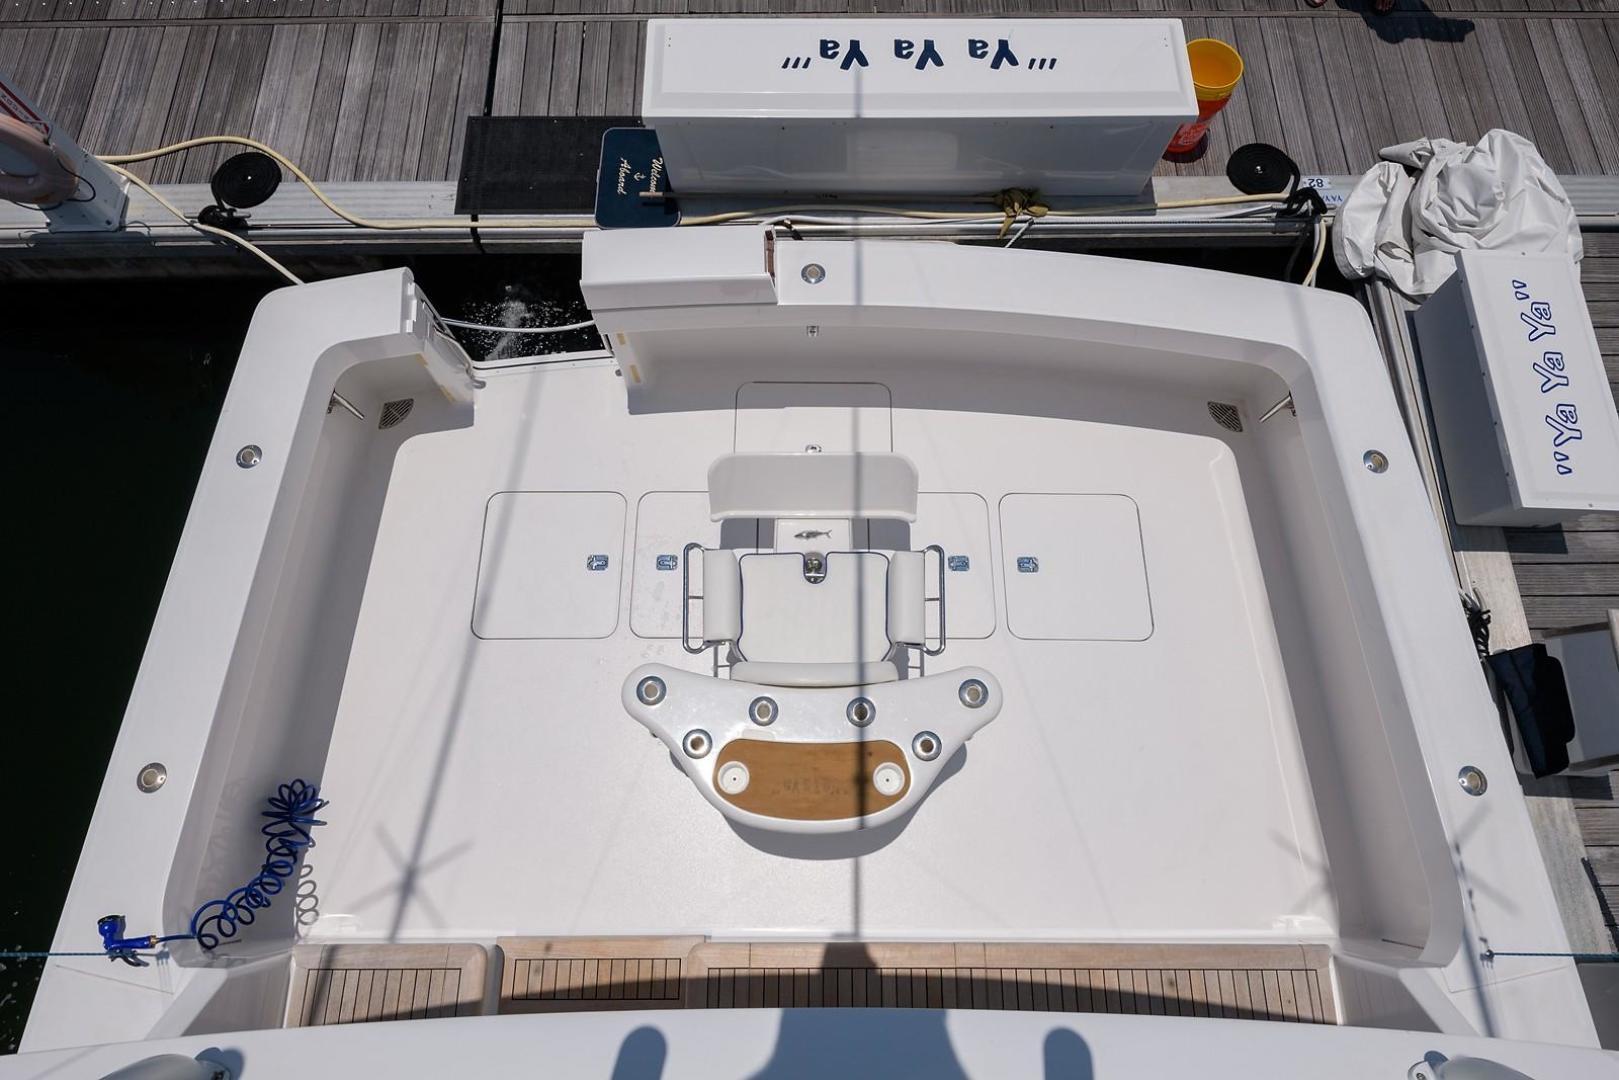 Viking-61 Enclosed Bridge Convertible 2005-Ya Ya Ya North Palm Beach-Florida-United States-1258055 | Thumbnail